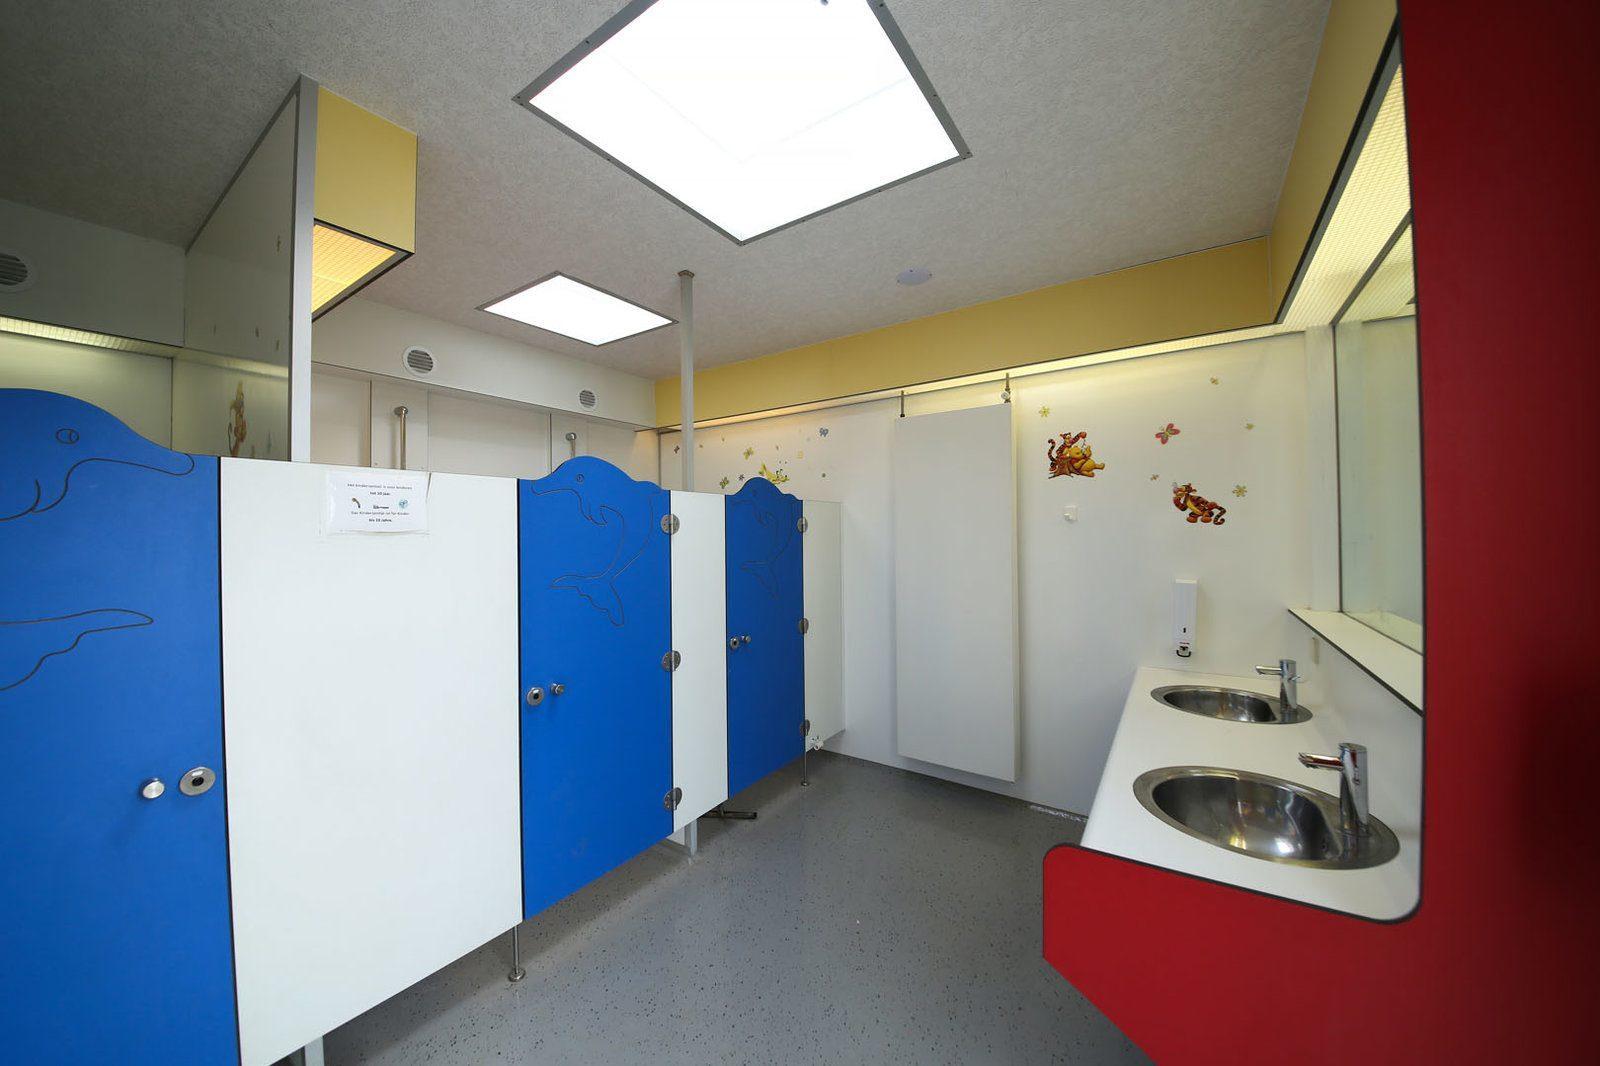 Sanitair | Petite Suisse